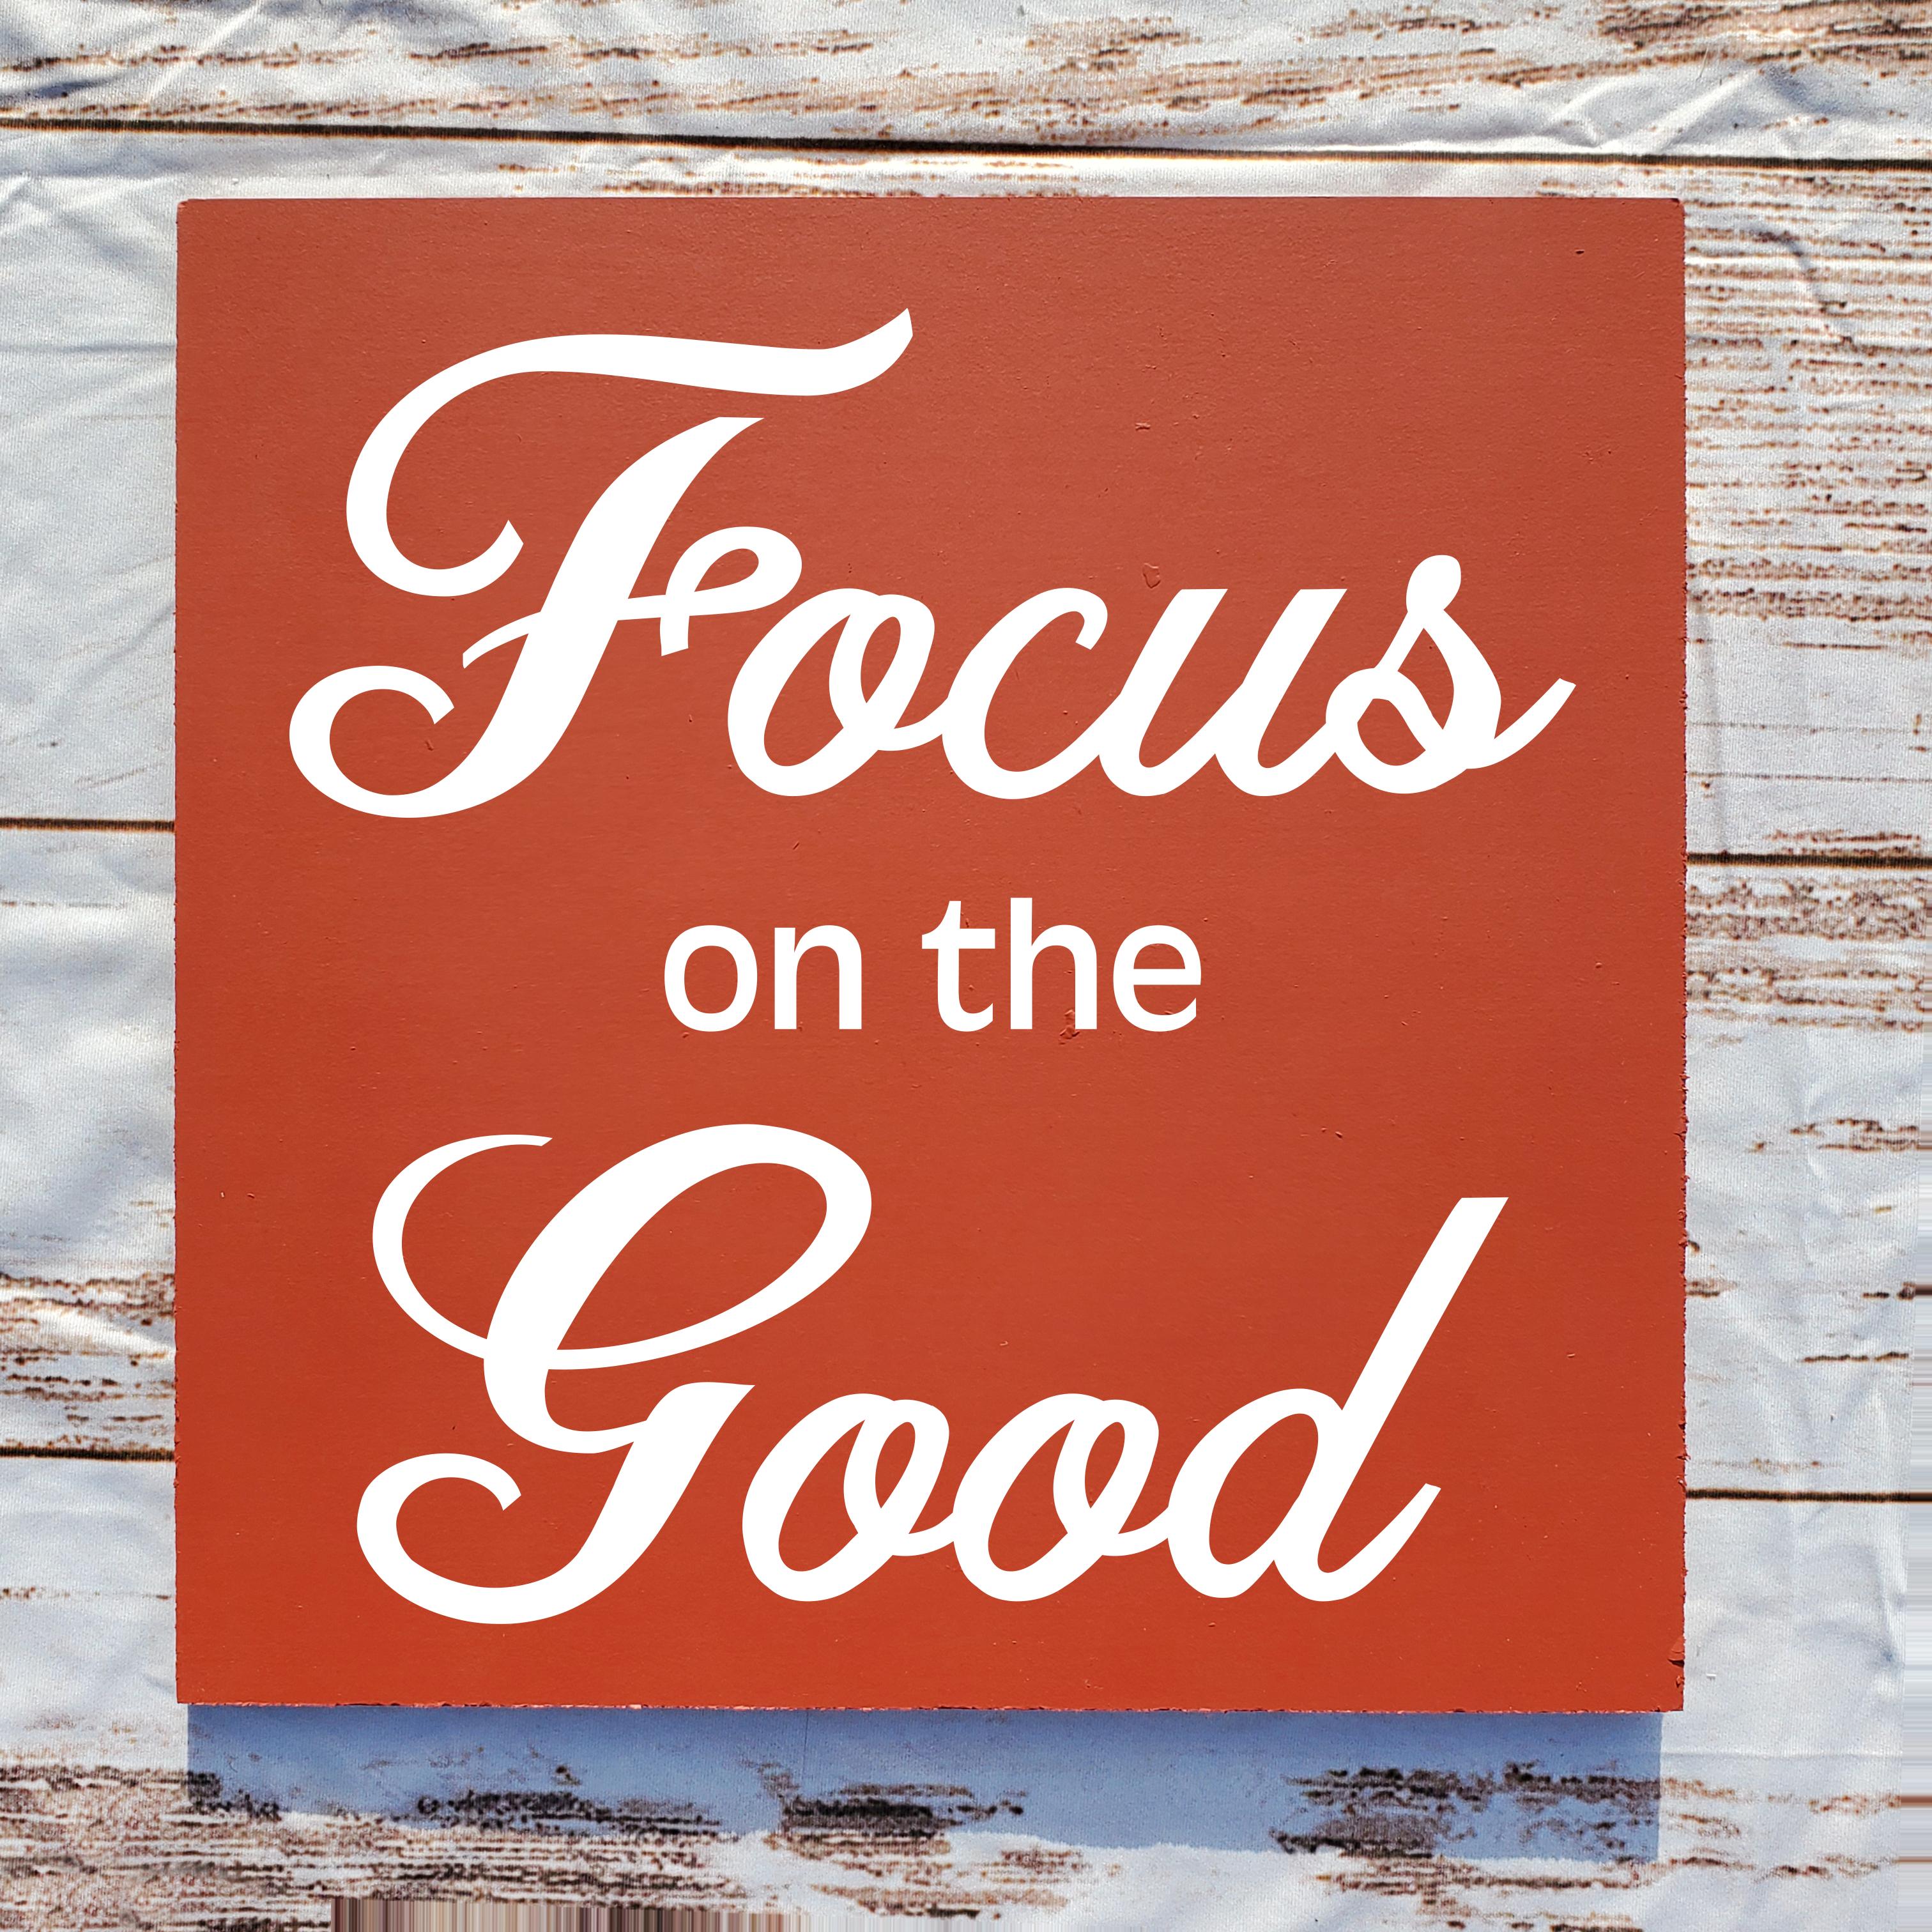 540 - Focus on the Good